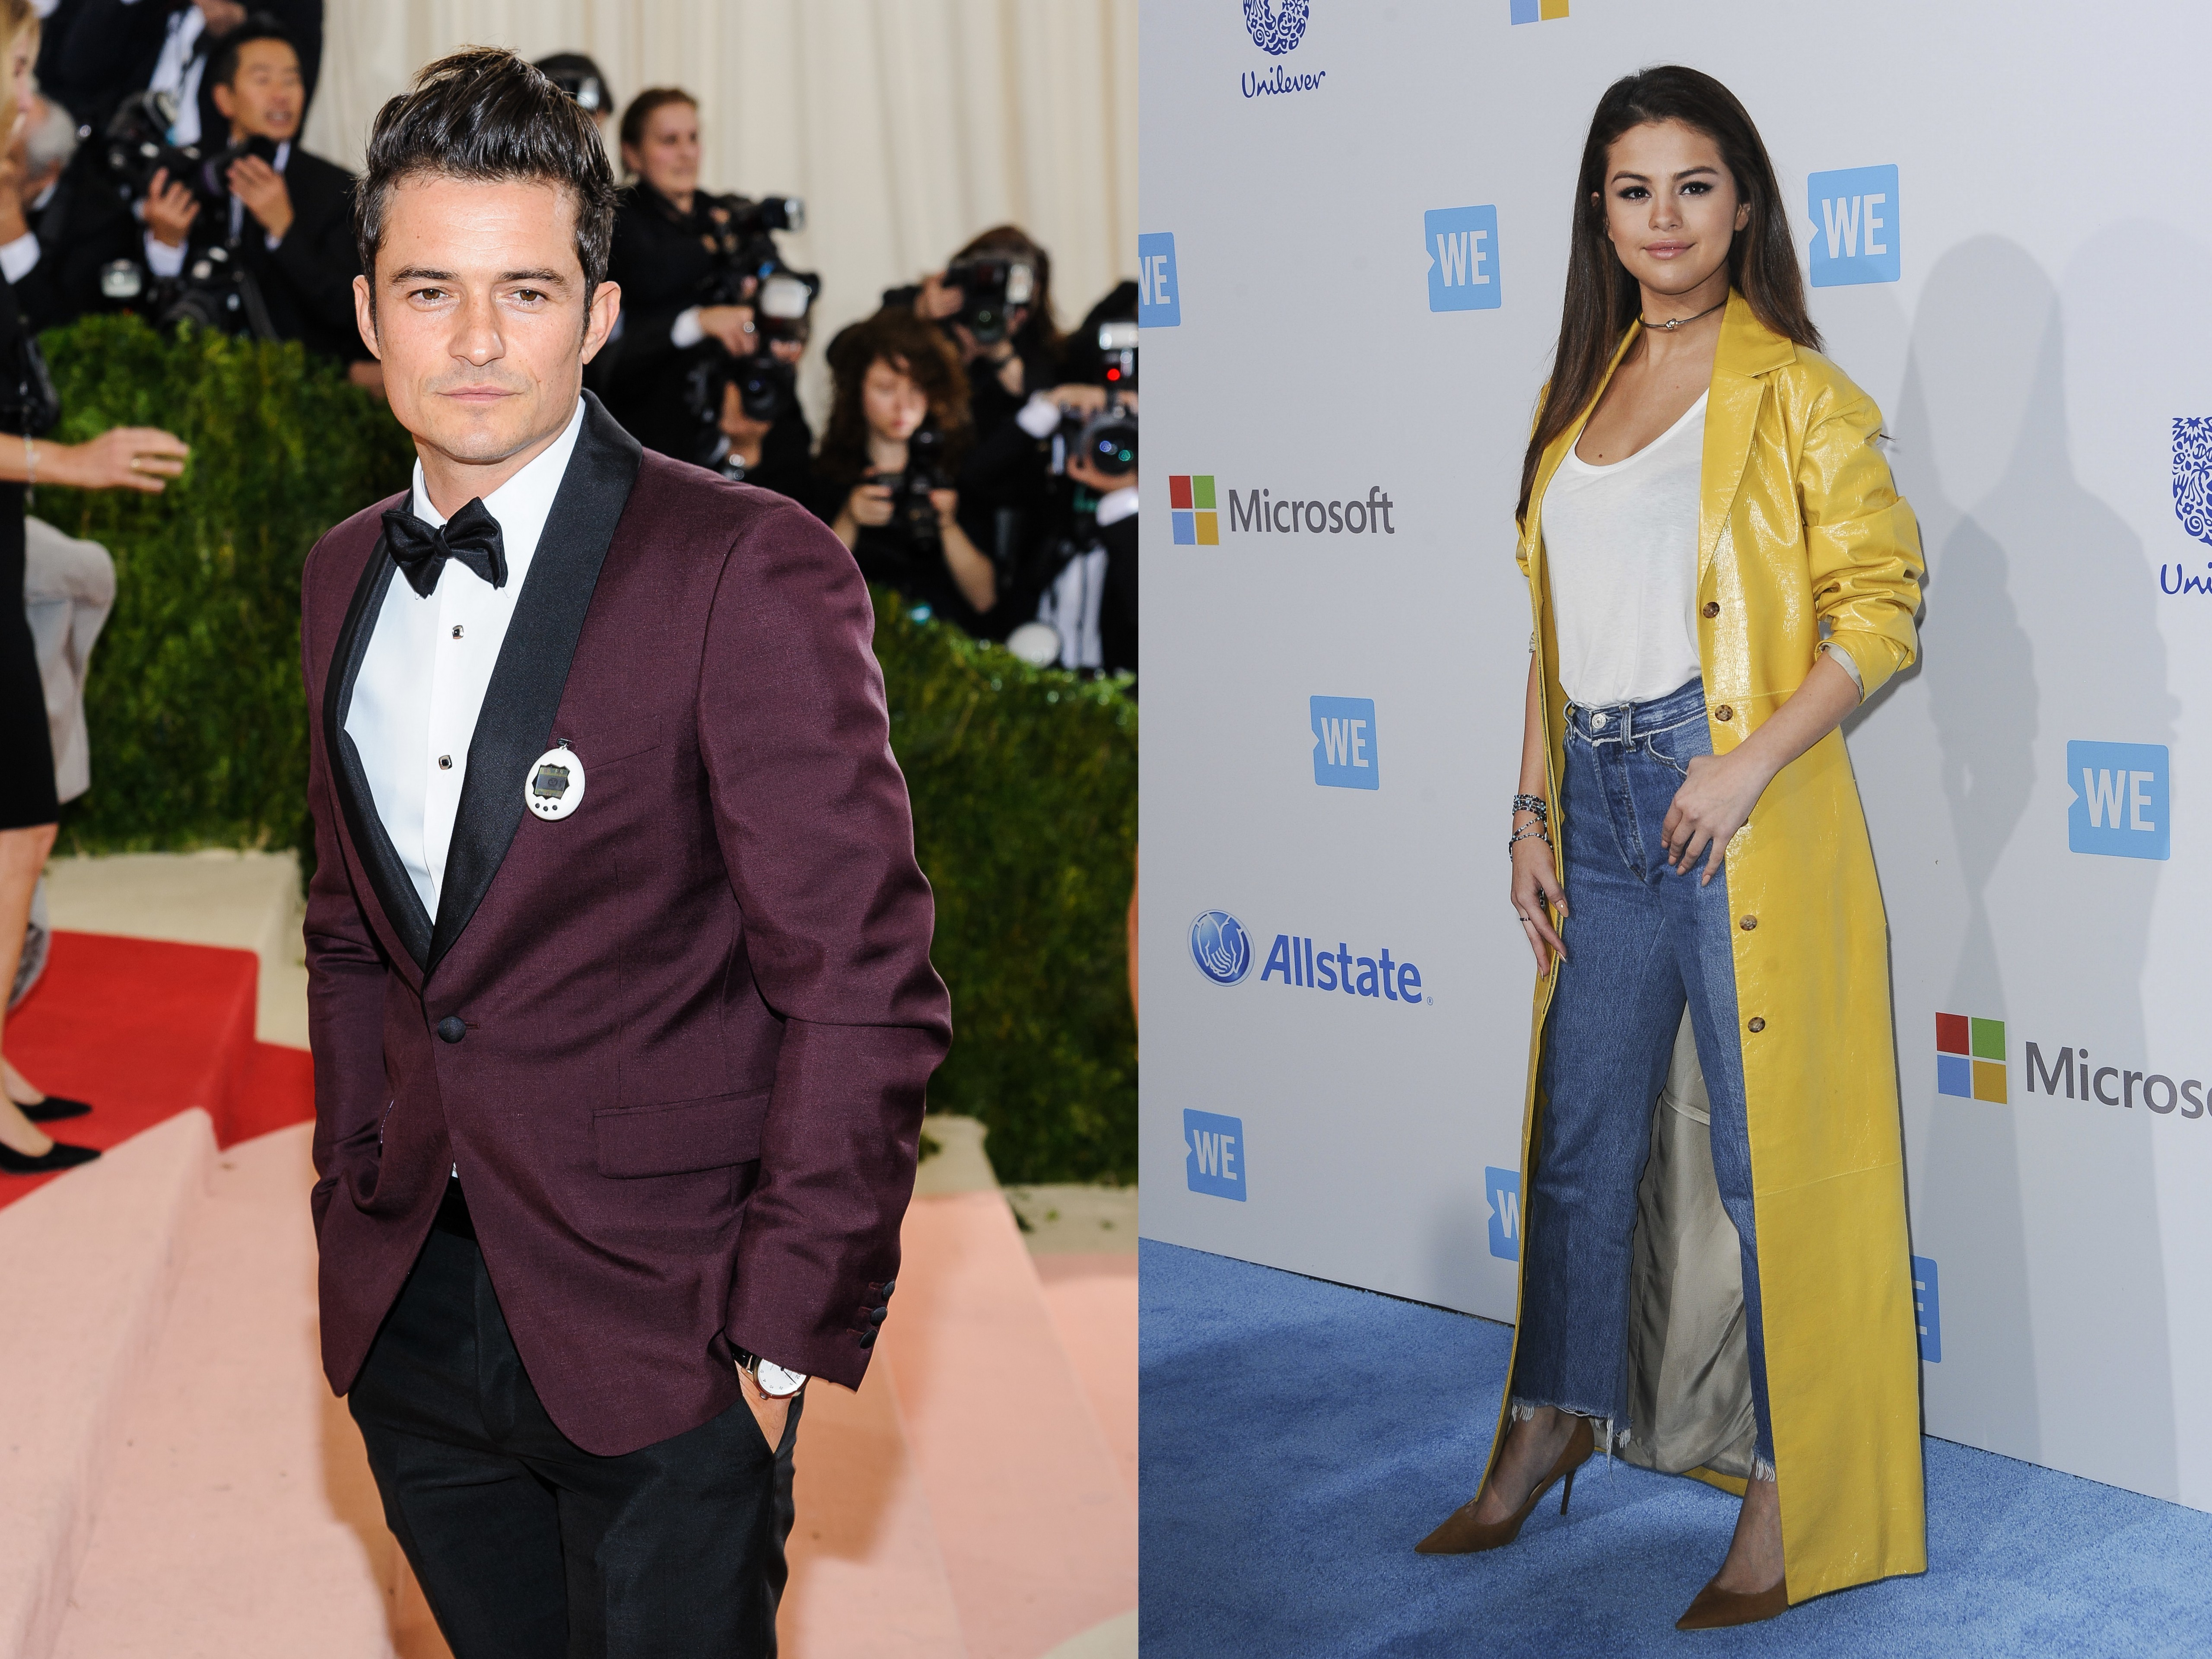 Did Orlando Bloom hook up with Selena Gomez?